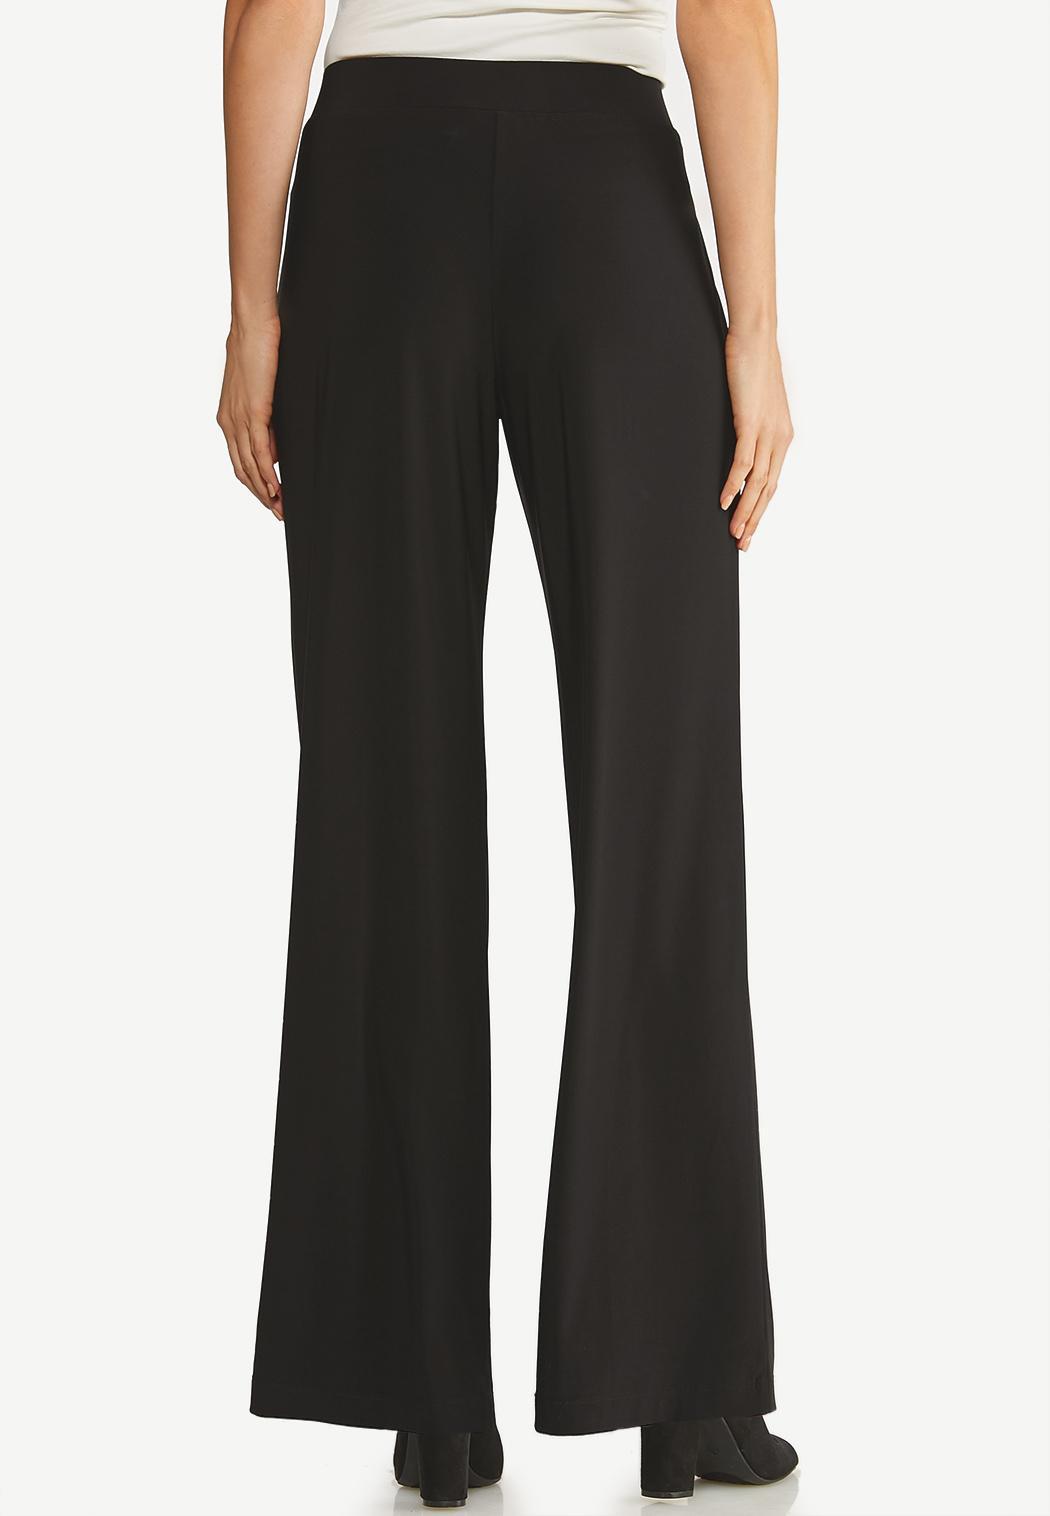 Petite Black Tie Front Palazzo Pants (Item #44106350)